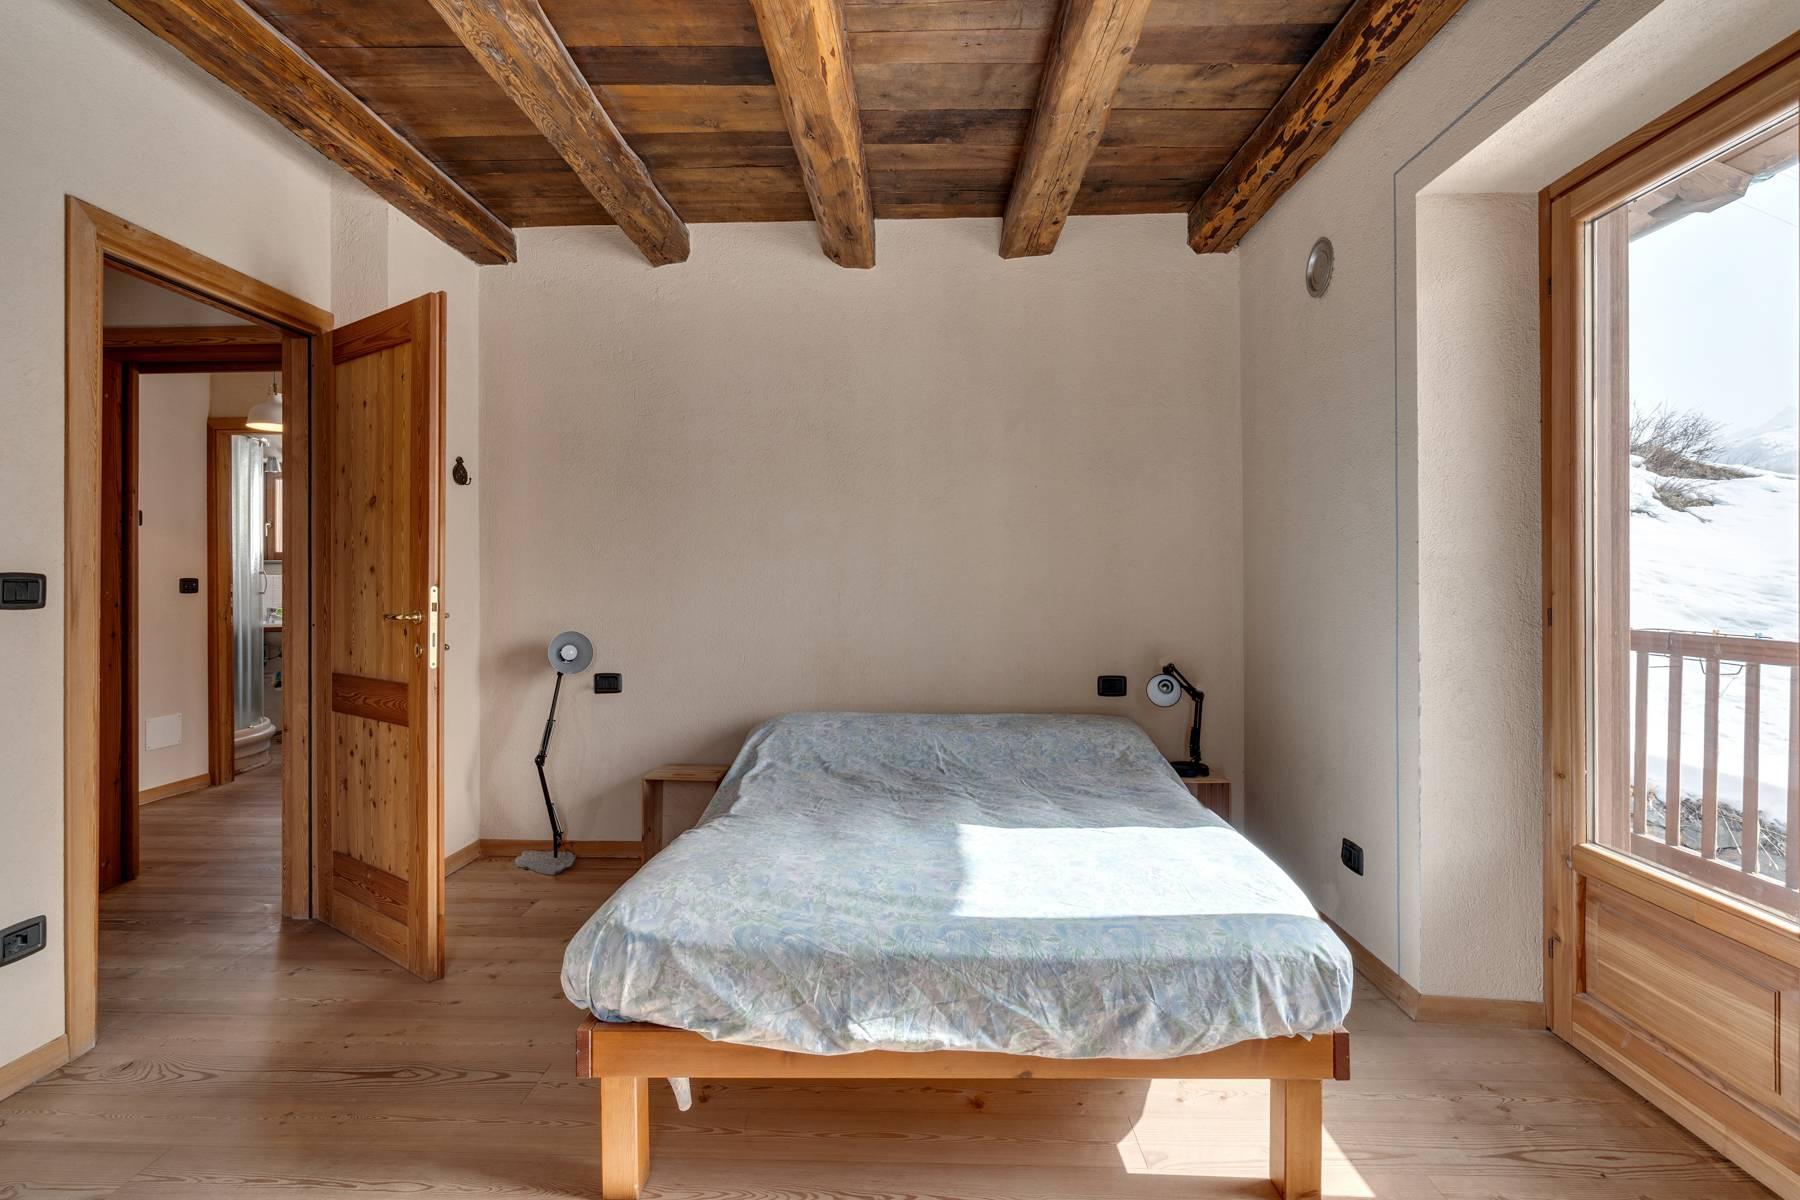 Villa in Vendita a Cogne: 5 locali, 384 mq - Foto 19